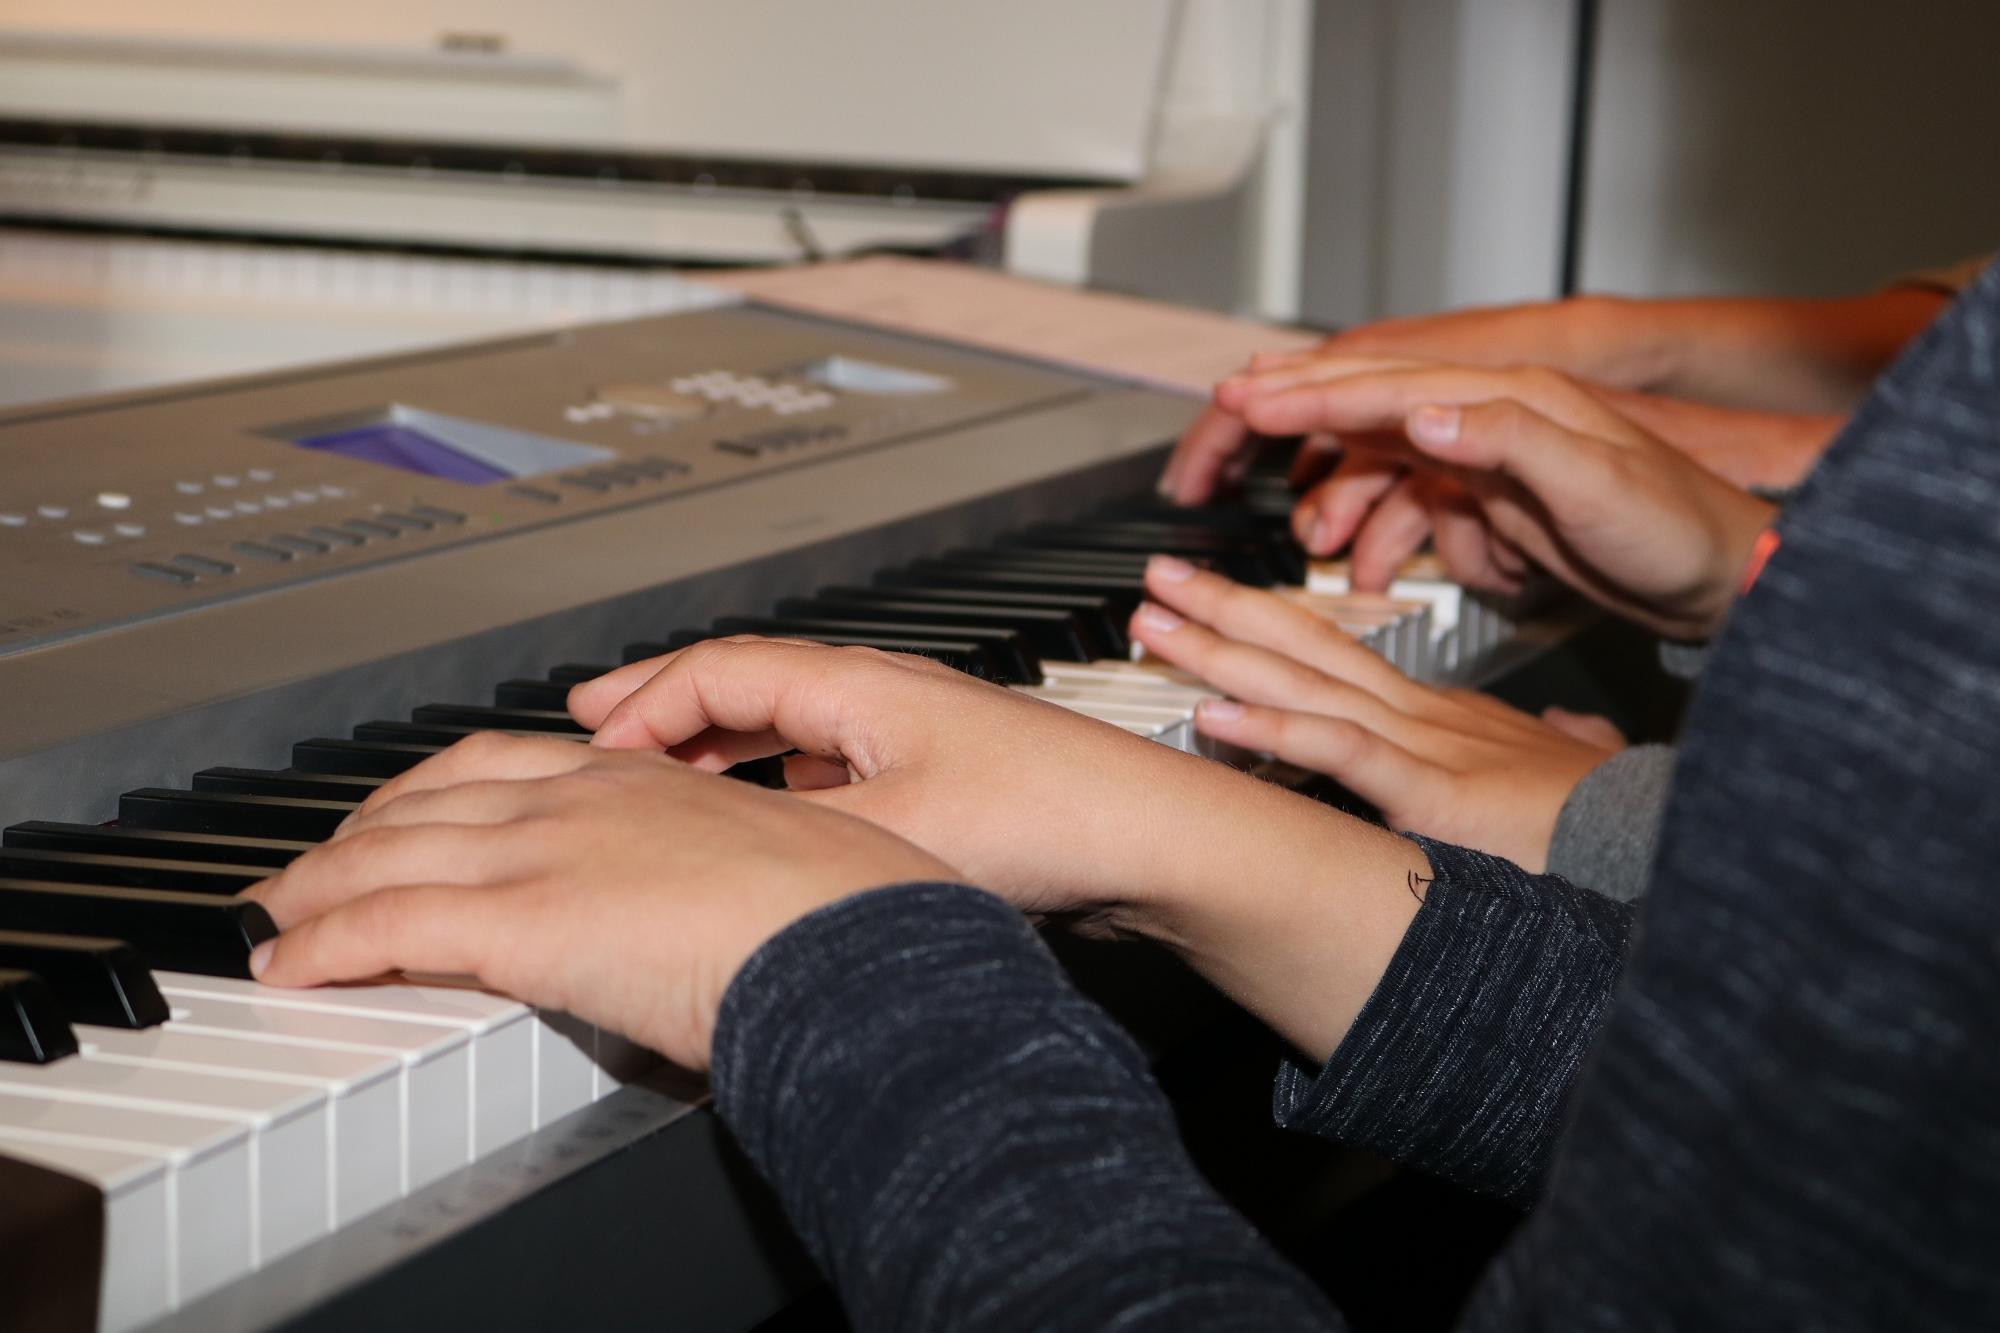 202007 Bandprobe FP Musikschule Harmonie 18